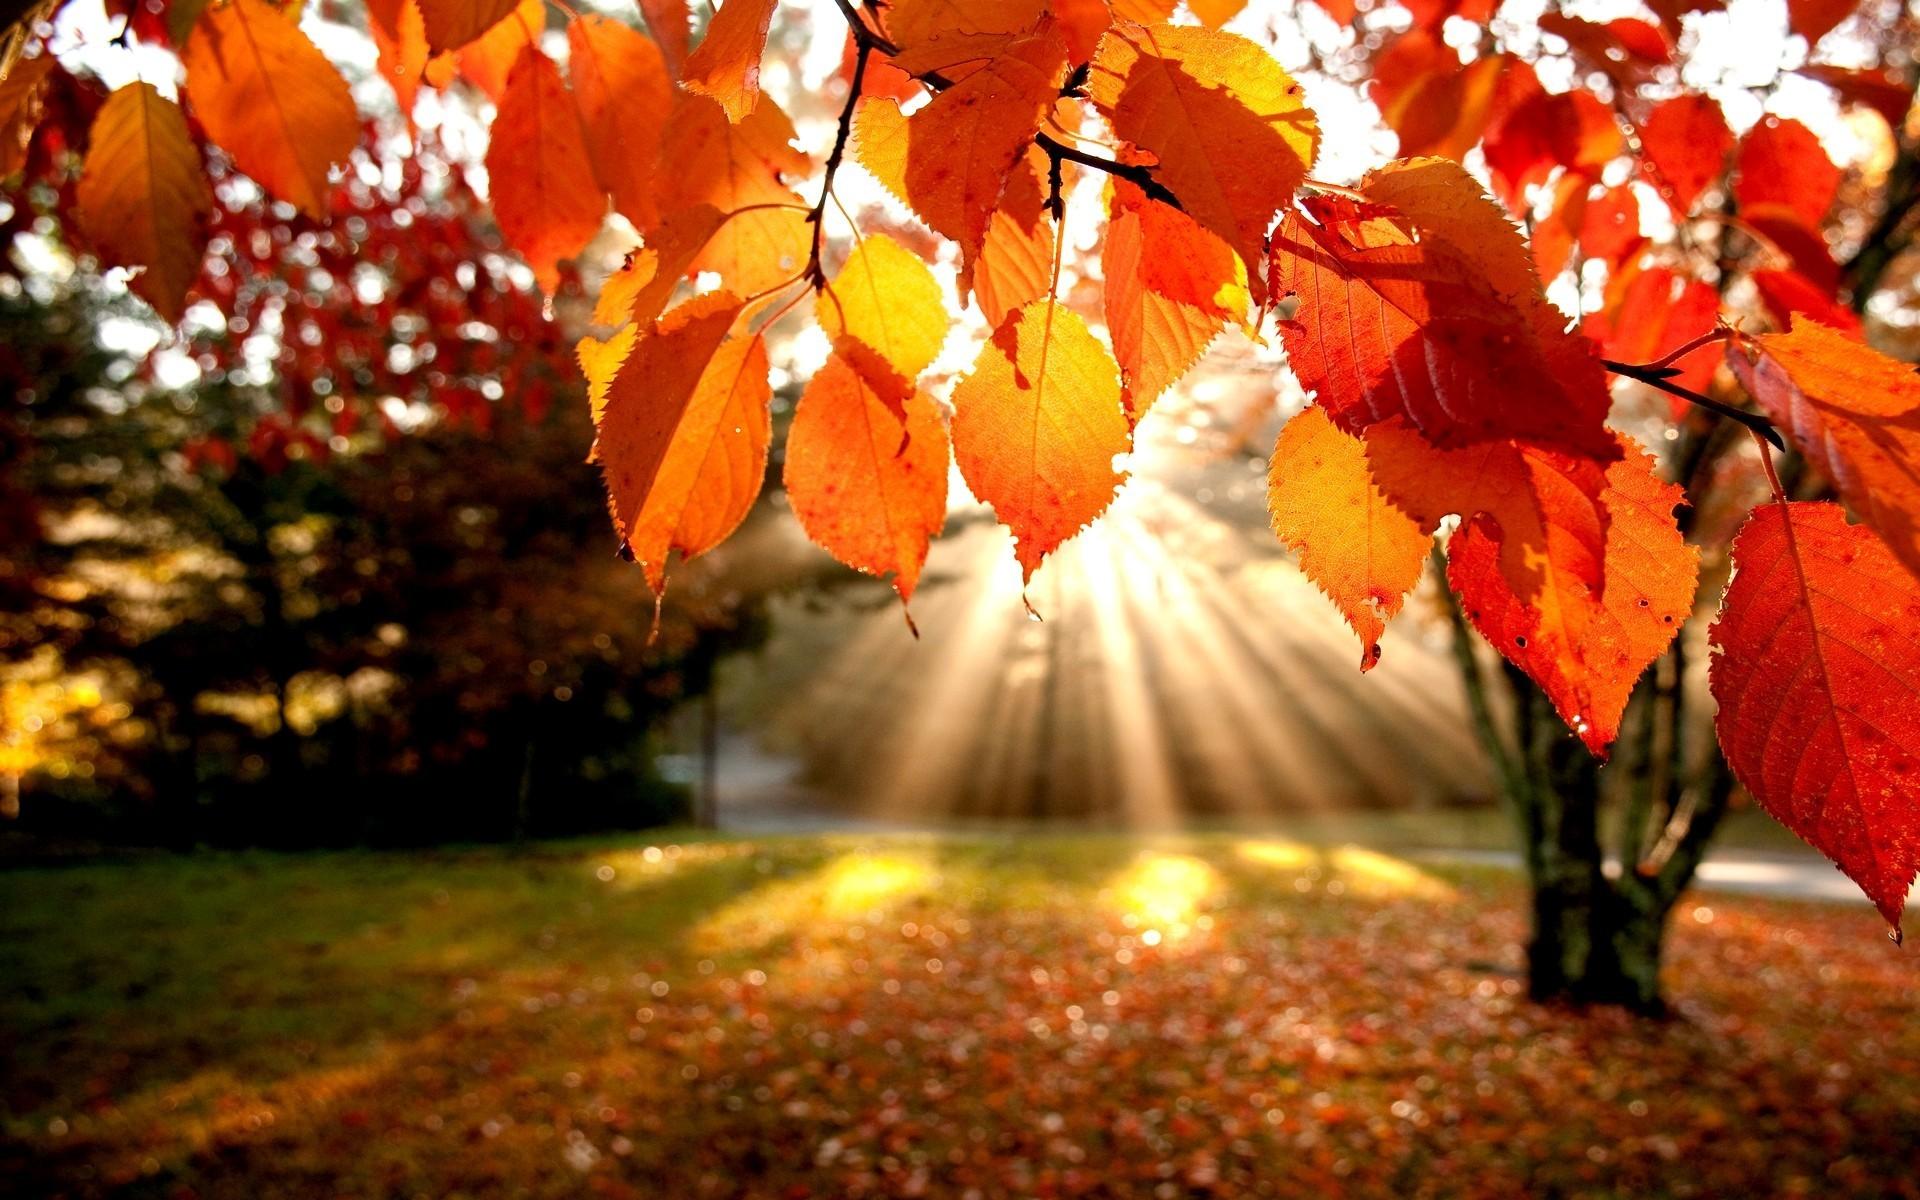 Fall Leaves Wallpapers for Desktop wallpaper Fall Leaves Wallpapers 1920x1200